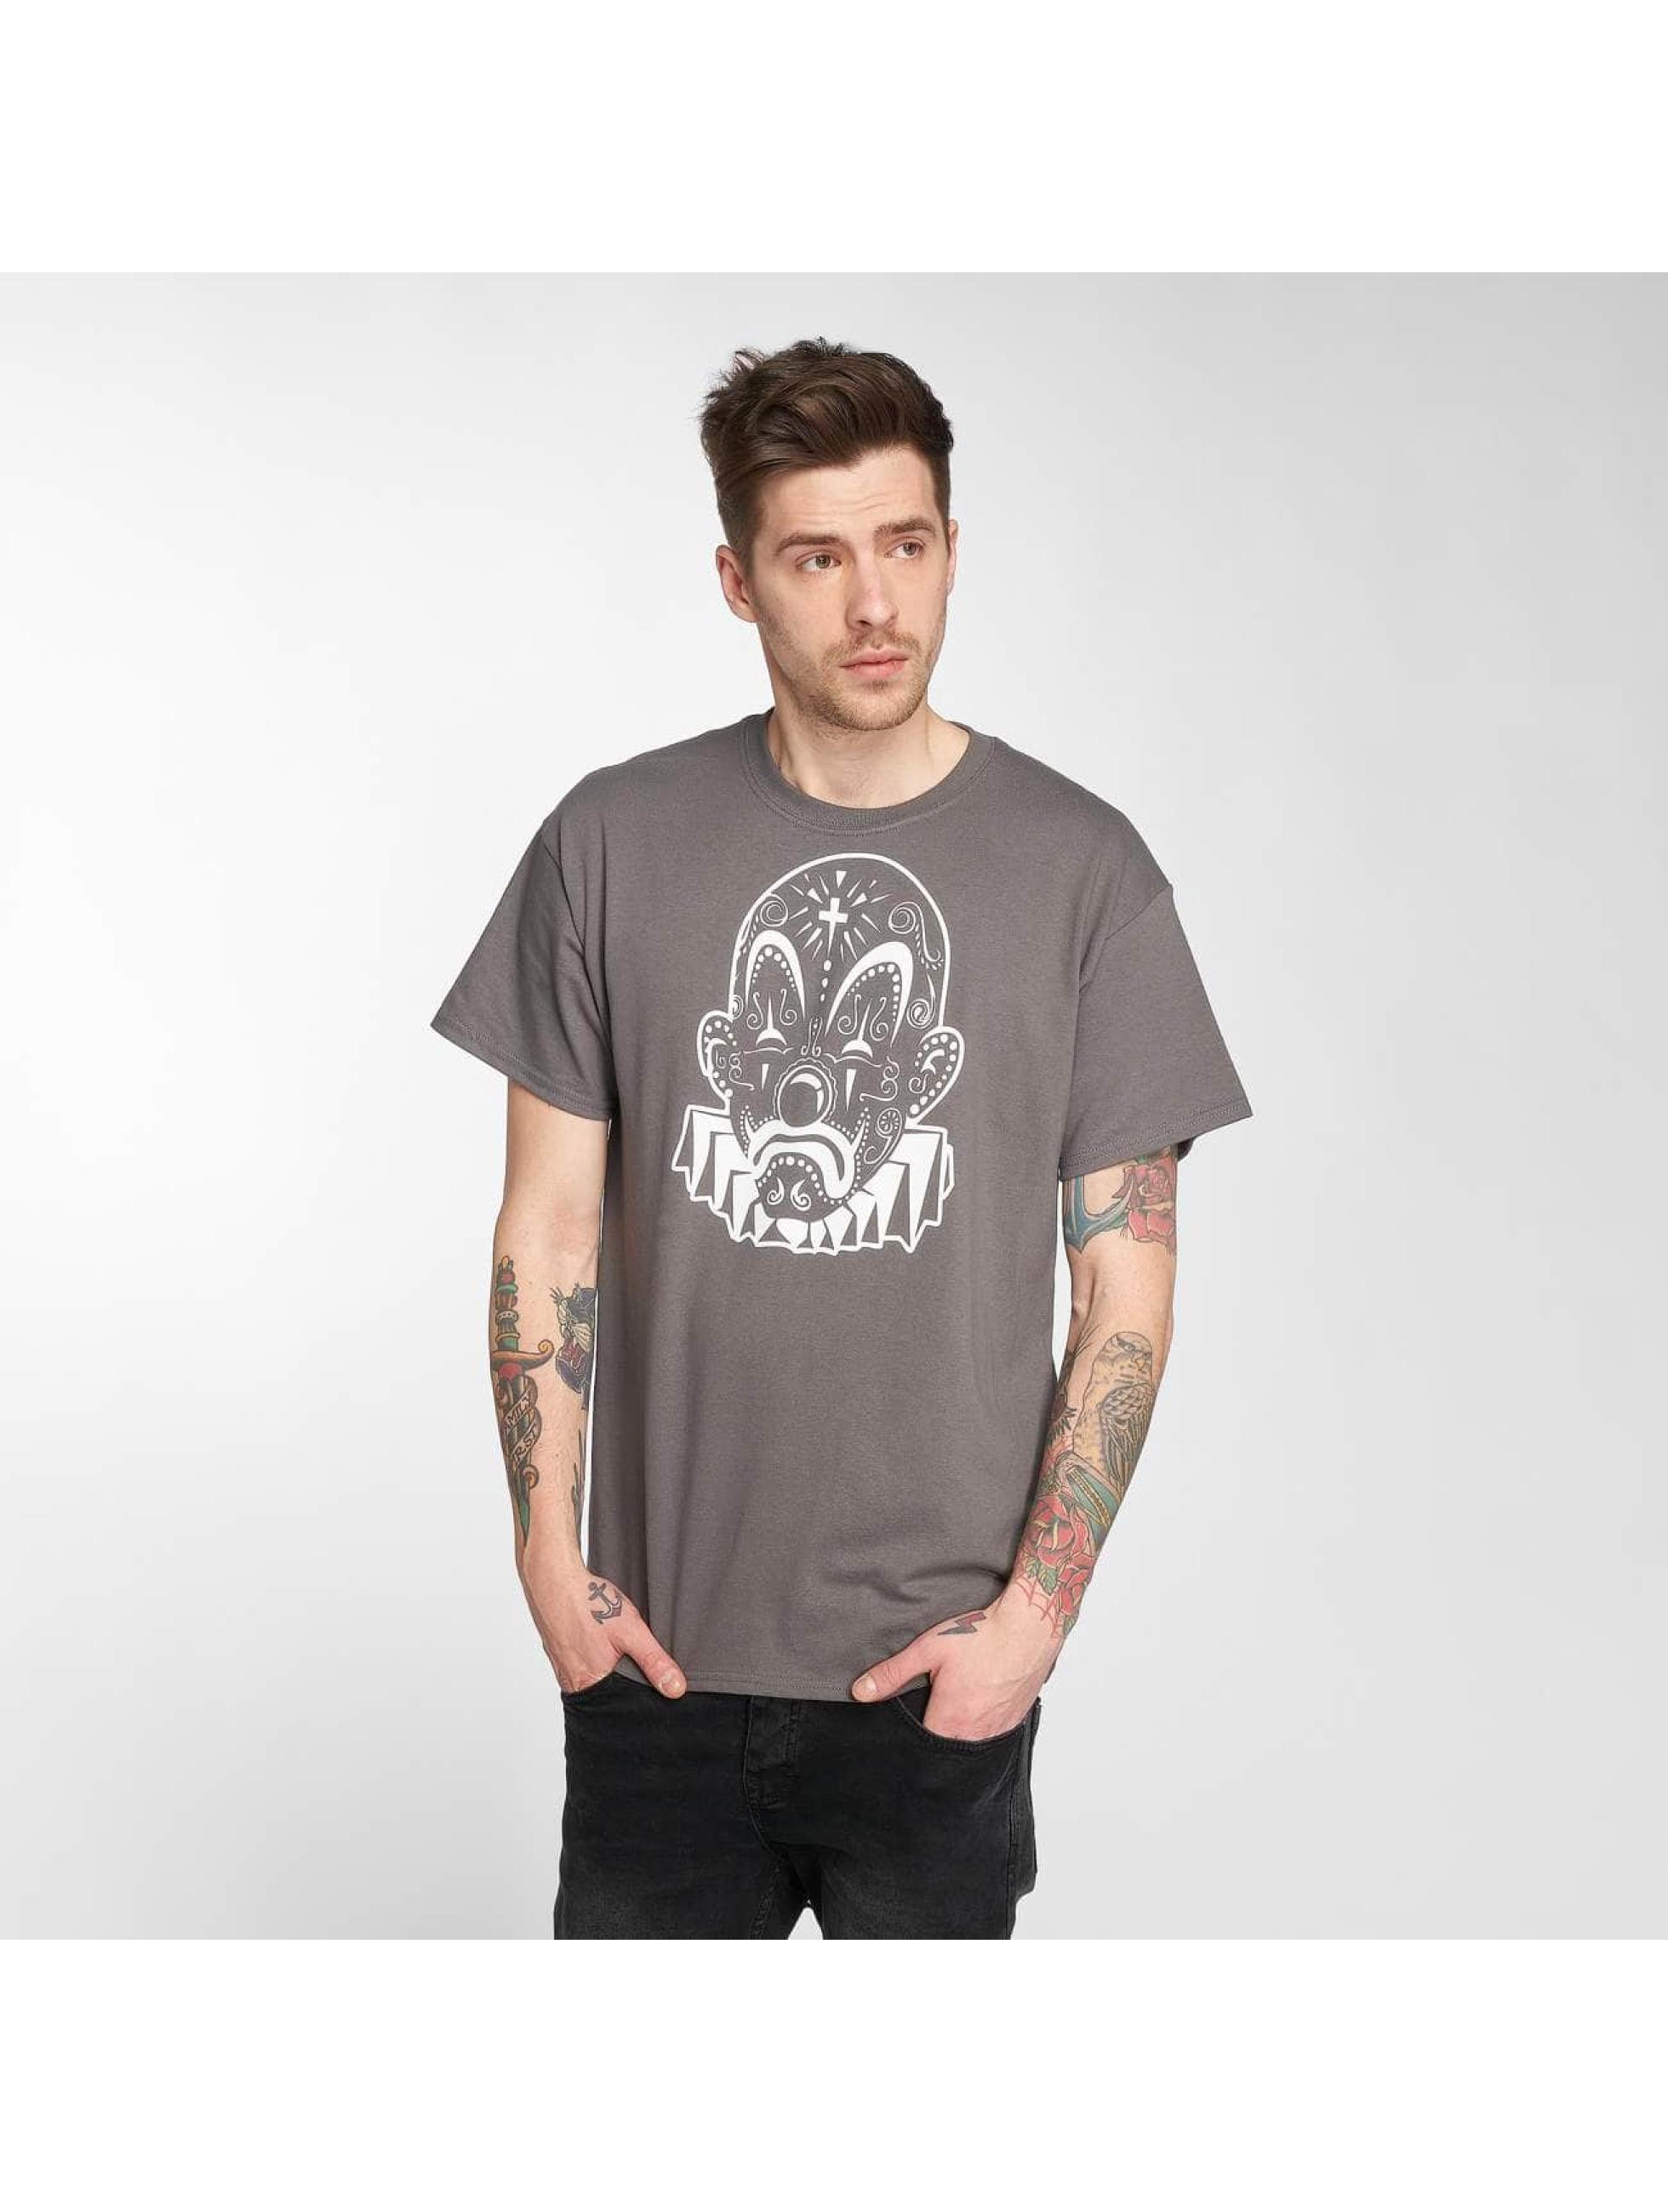 Joker T-shirt Mexico Clown grigio